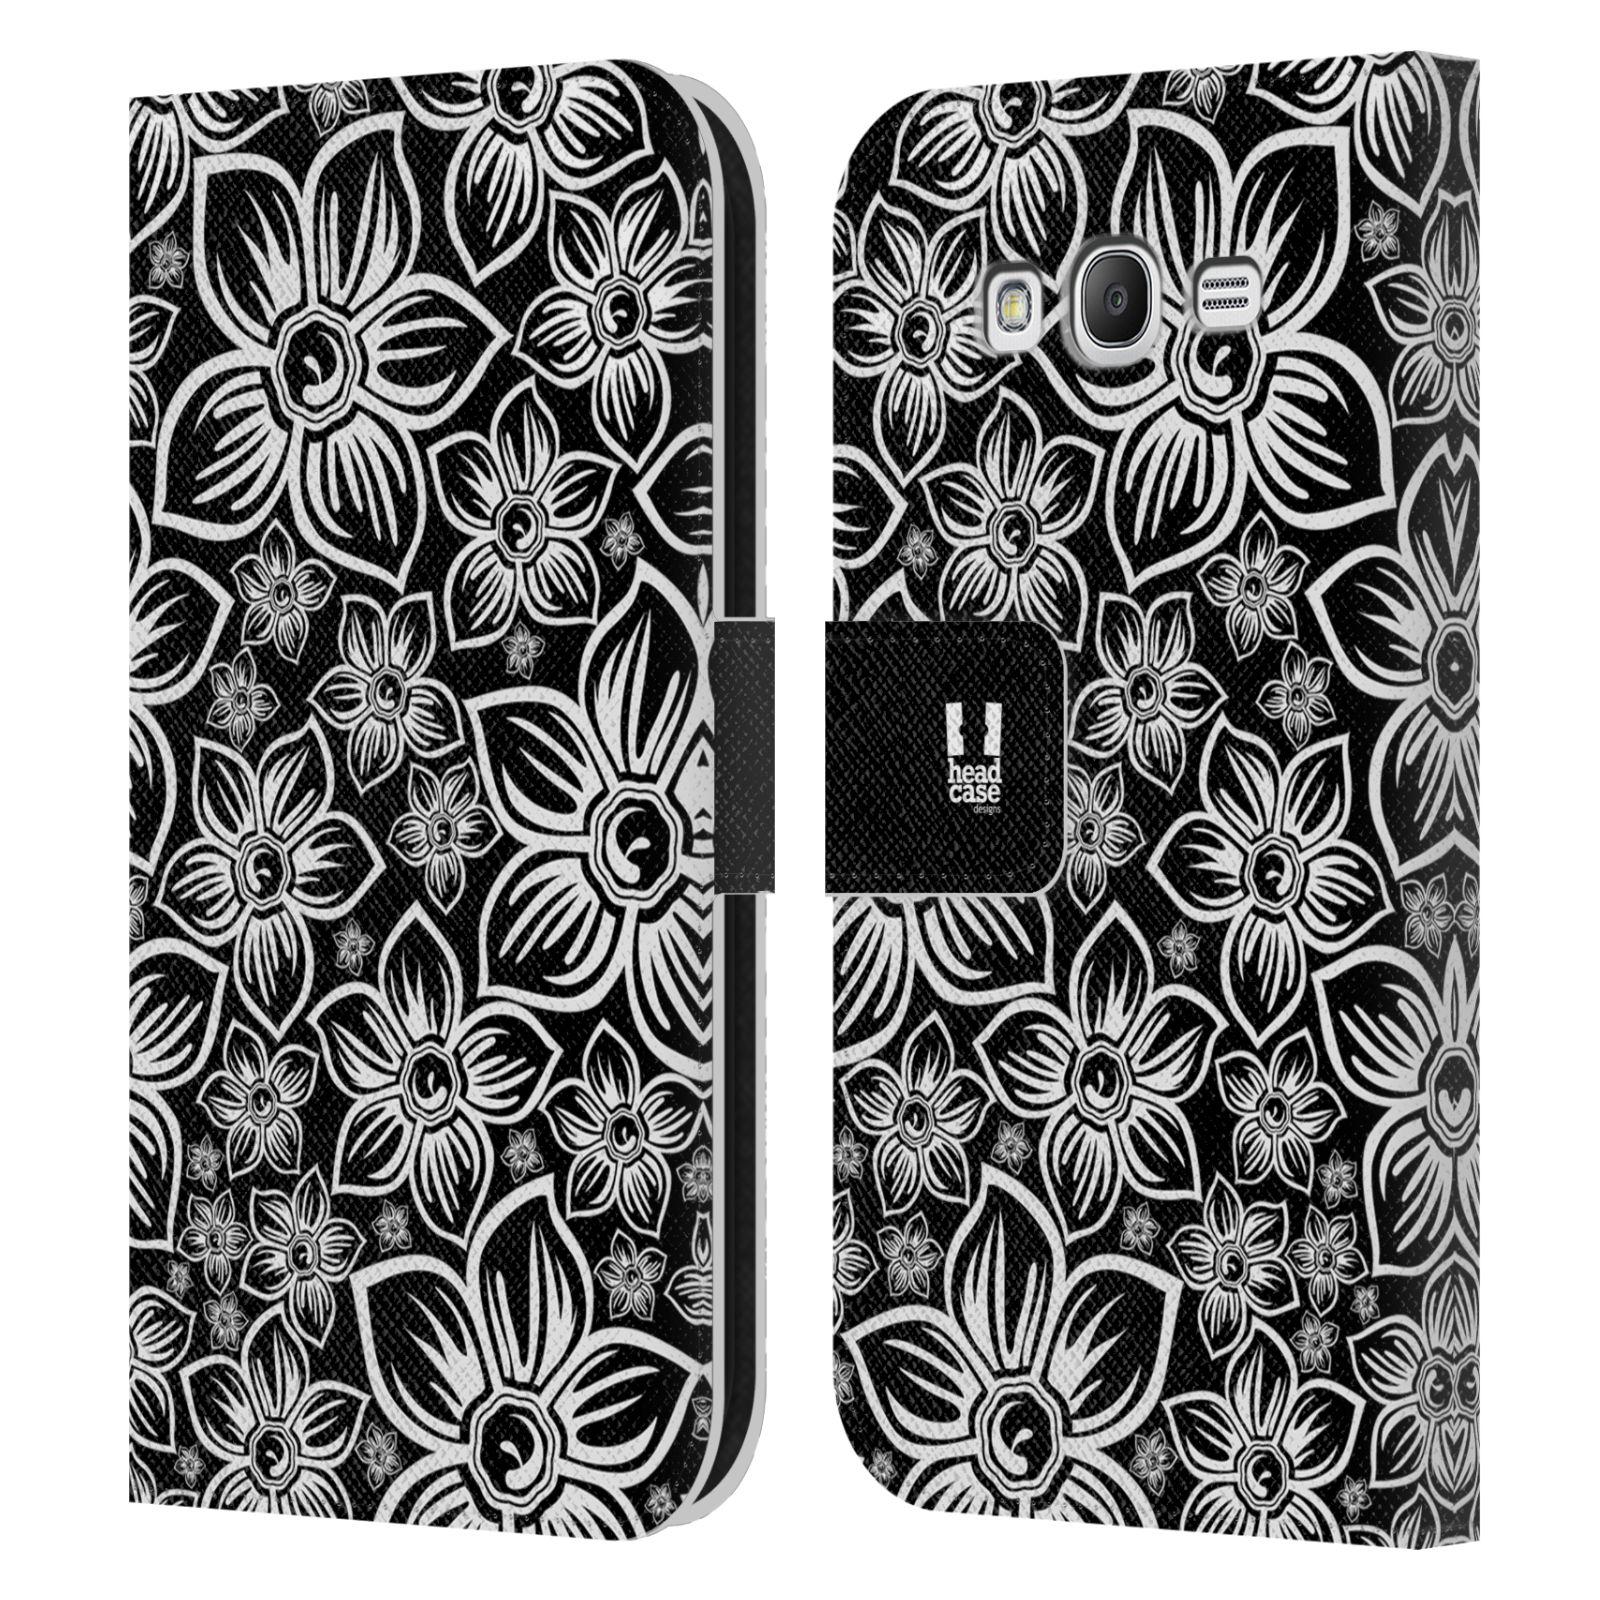 HEAD CASE Flipové pouzdro pro mobil Samsung Galaxy Grand i9080 ČERNOBÍLÁ KVĚTINA sedmikráska